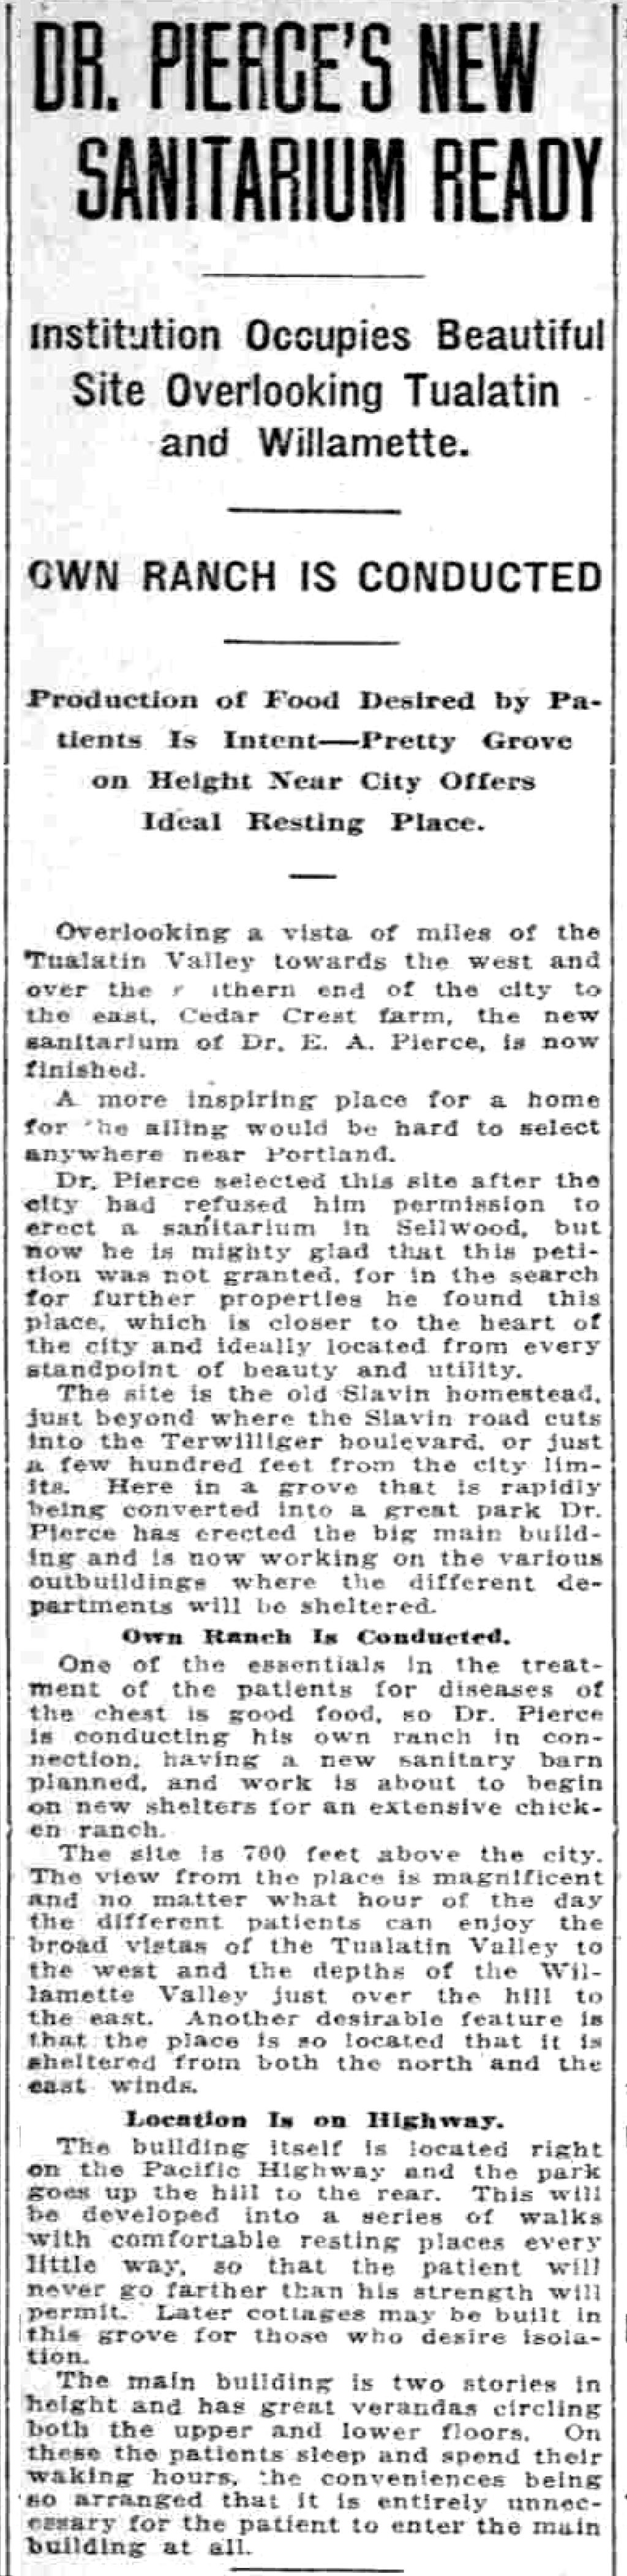 Pierce Sanitorium Article.  Sunday Oregonian, August 12, 1917.